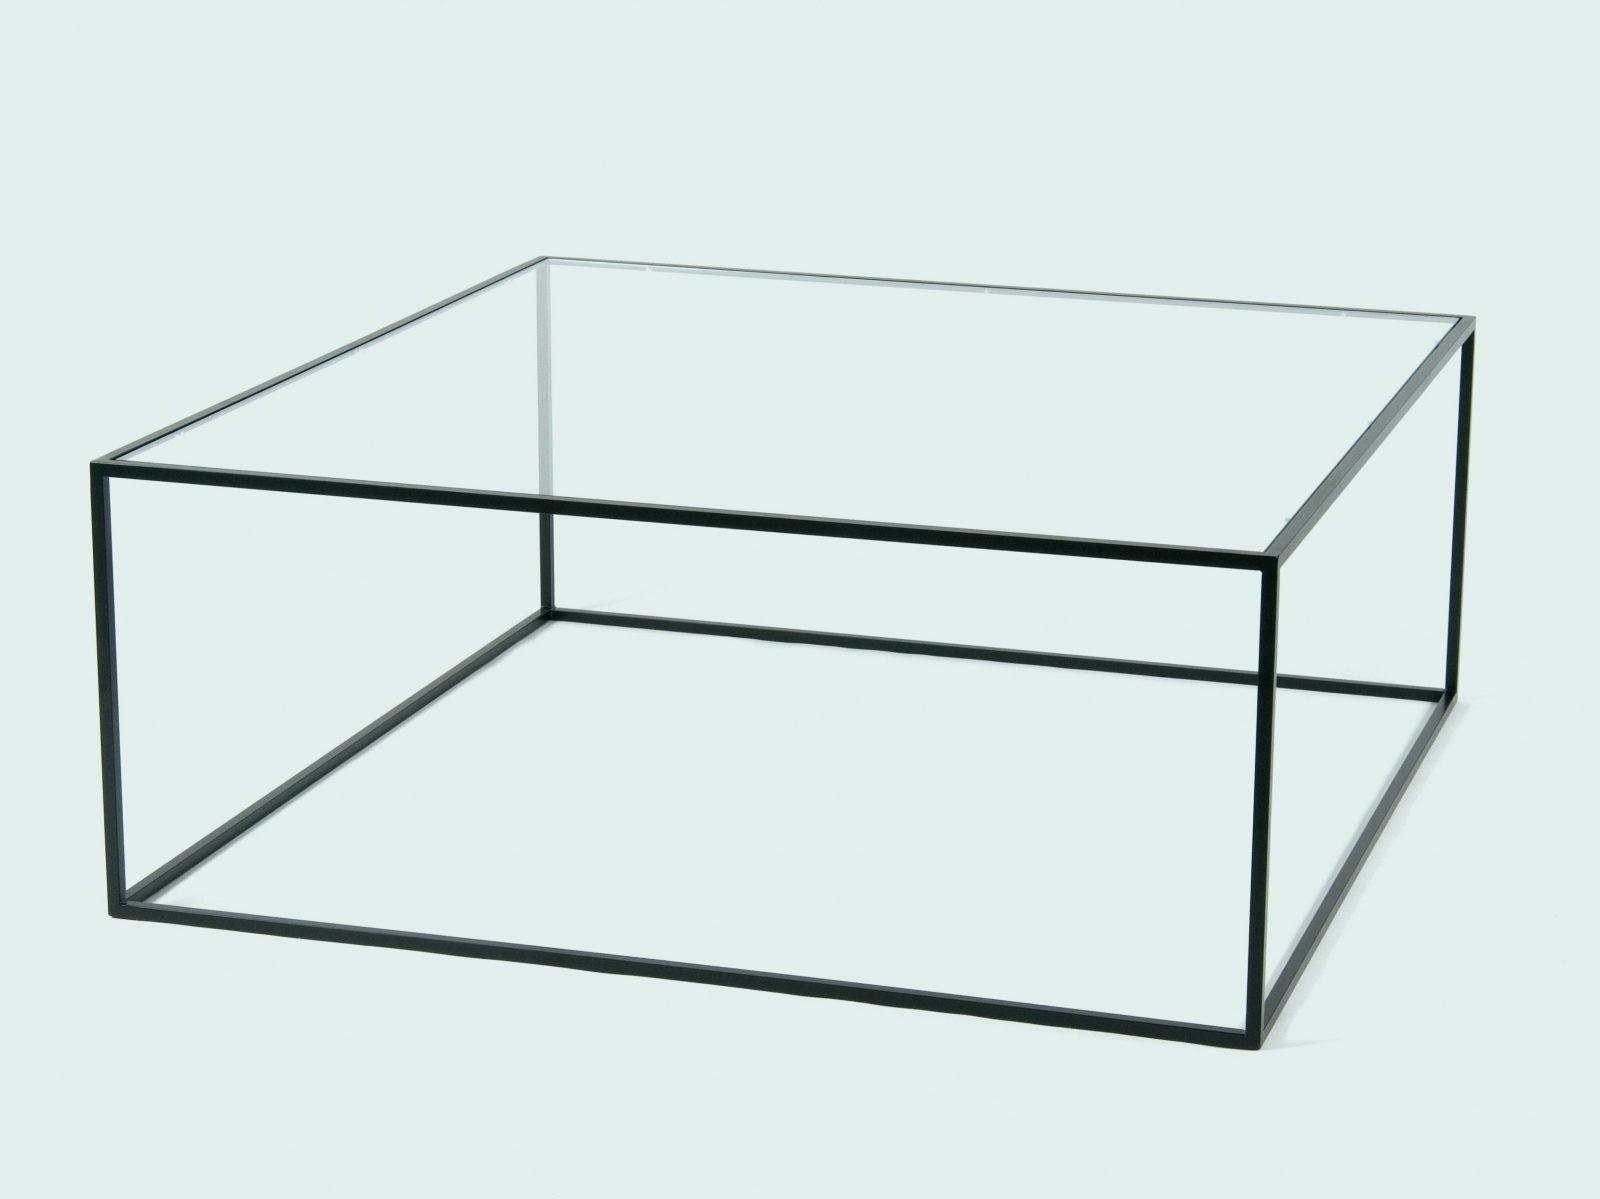 Couchtisch Glas Edelstahl Quadratisch Inspirational Couchtisch Ideen von Couchtisch Glas Metall Design Bild